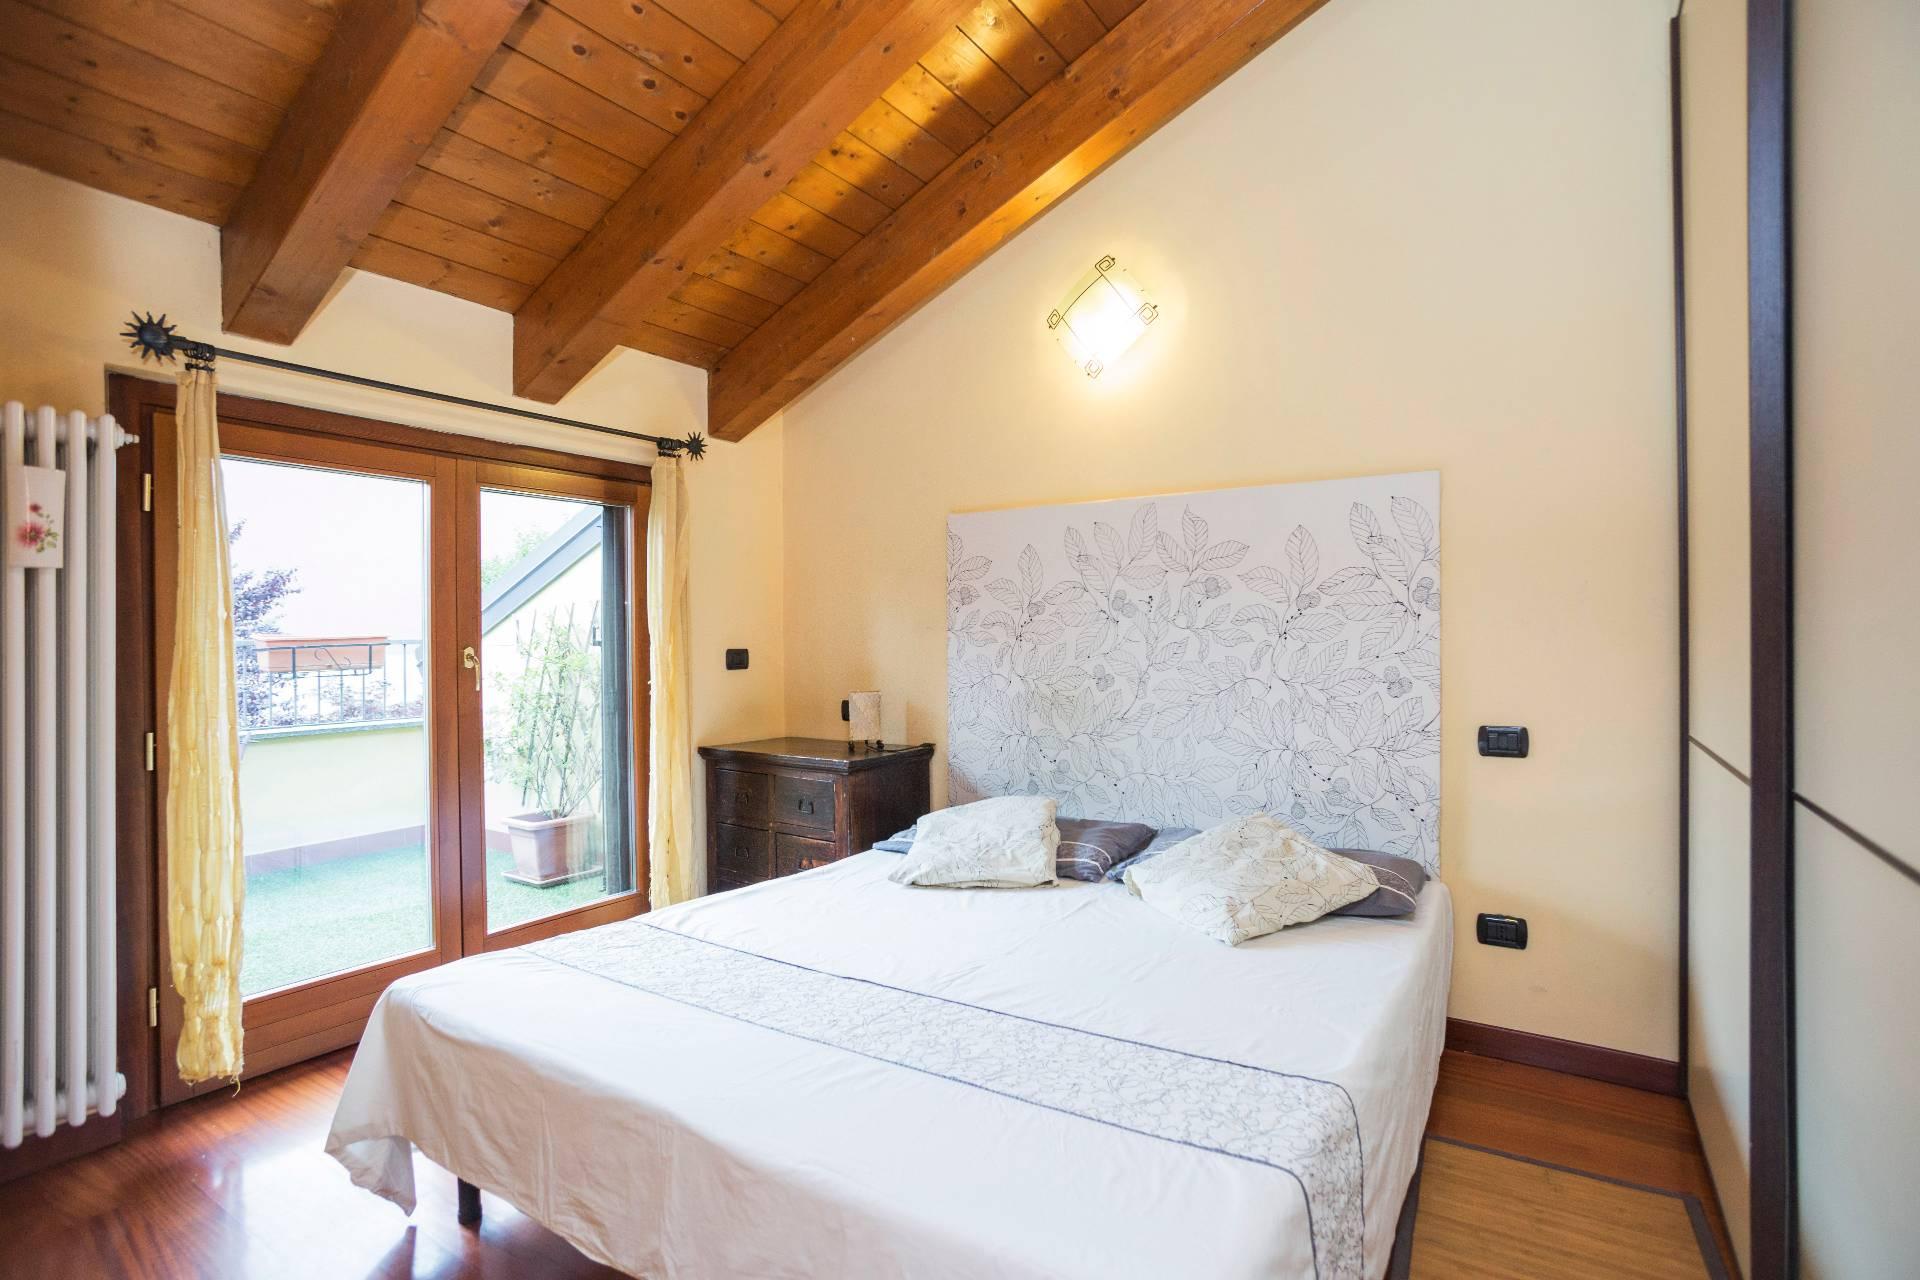 Appartamenti in vendita a rho trovocasa for Case in vendita rho